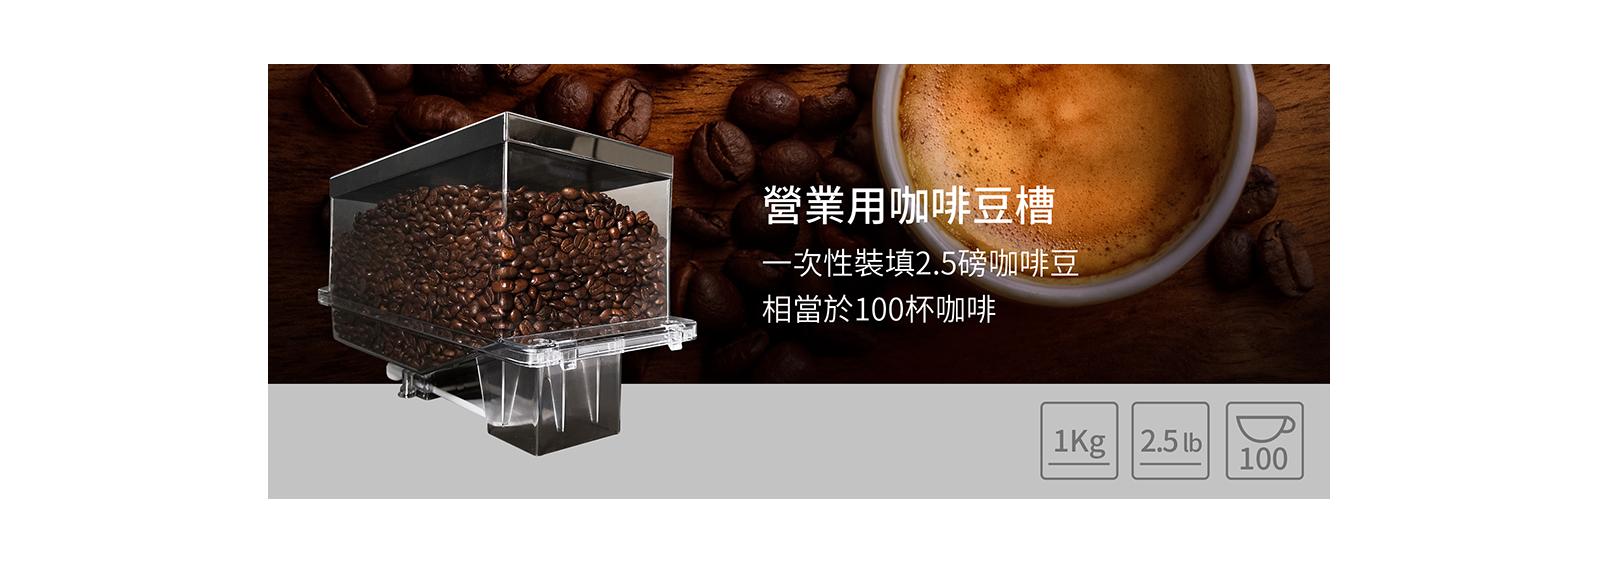 CoCoCafe咖啡自動販賣機-ai1000-h咖啡豆槽